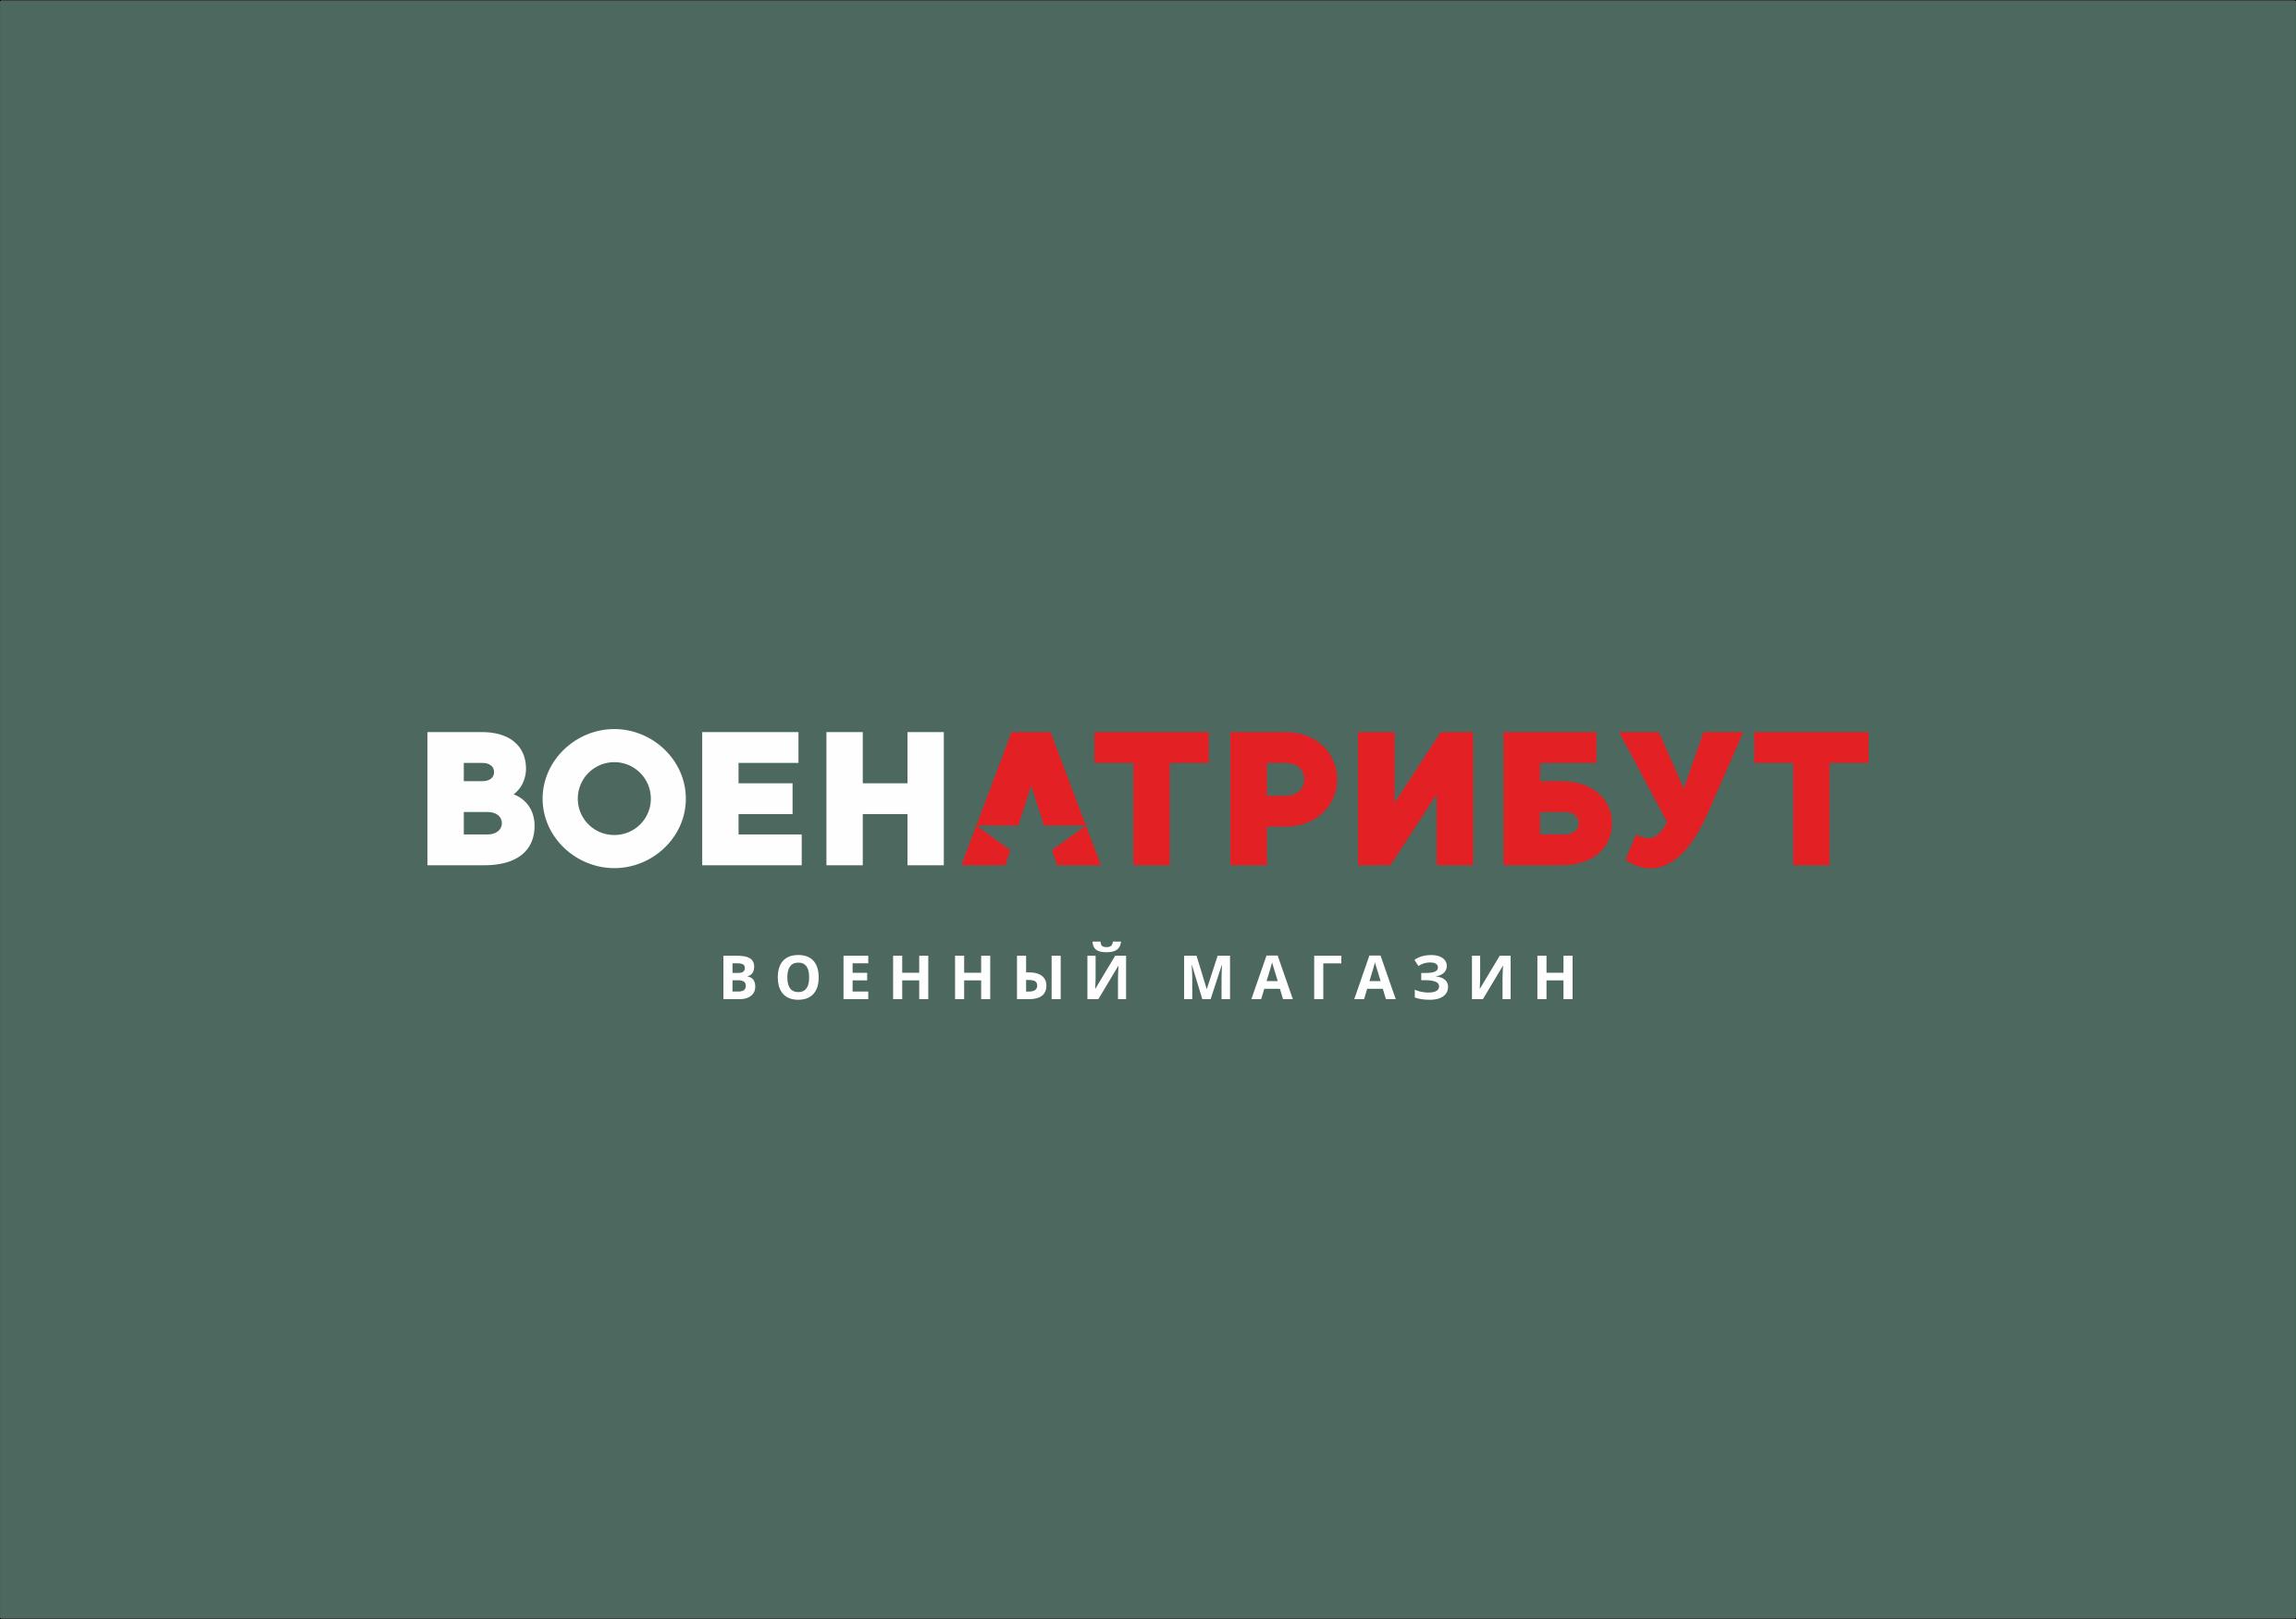 Разработка логотипа для компании военной тематики фото f_20660210f83eba9f.png